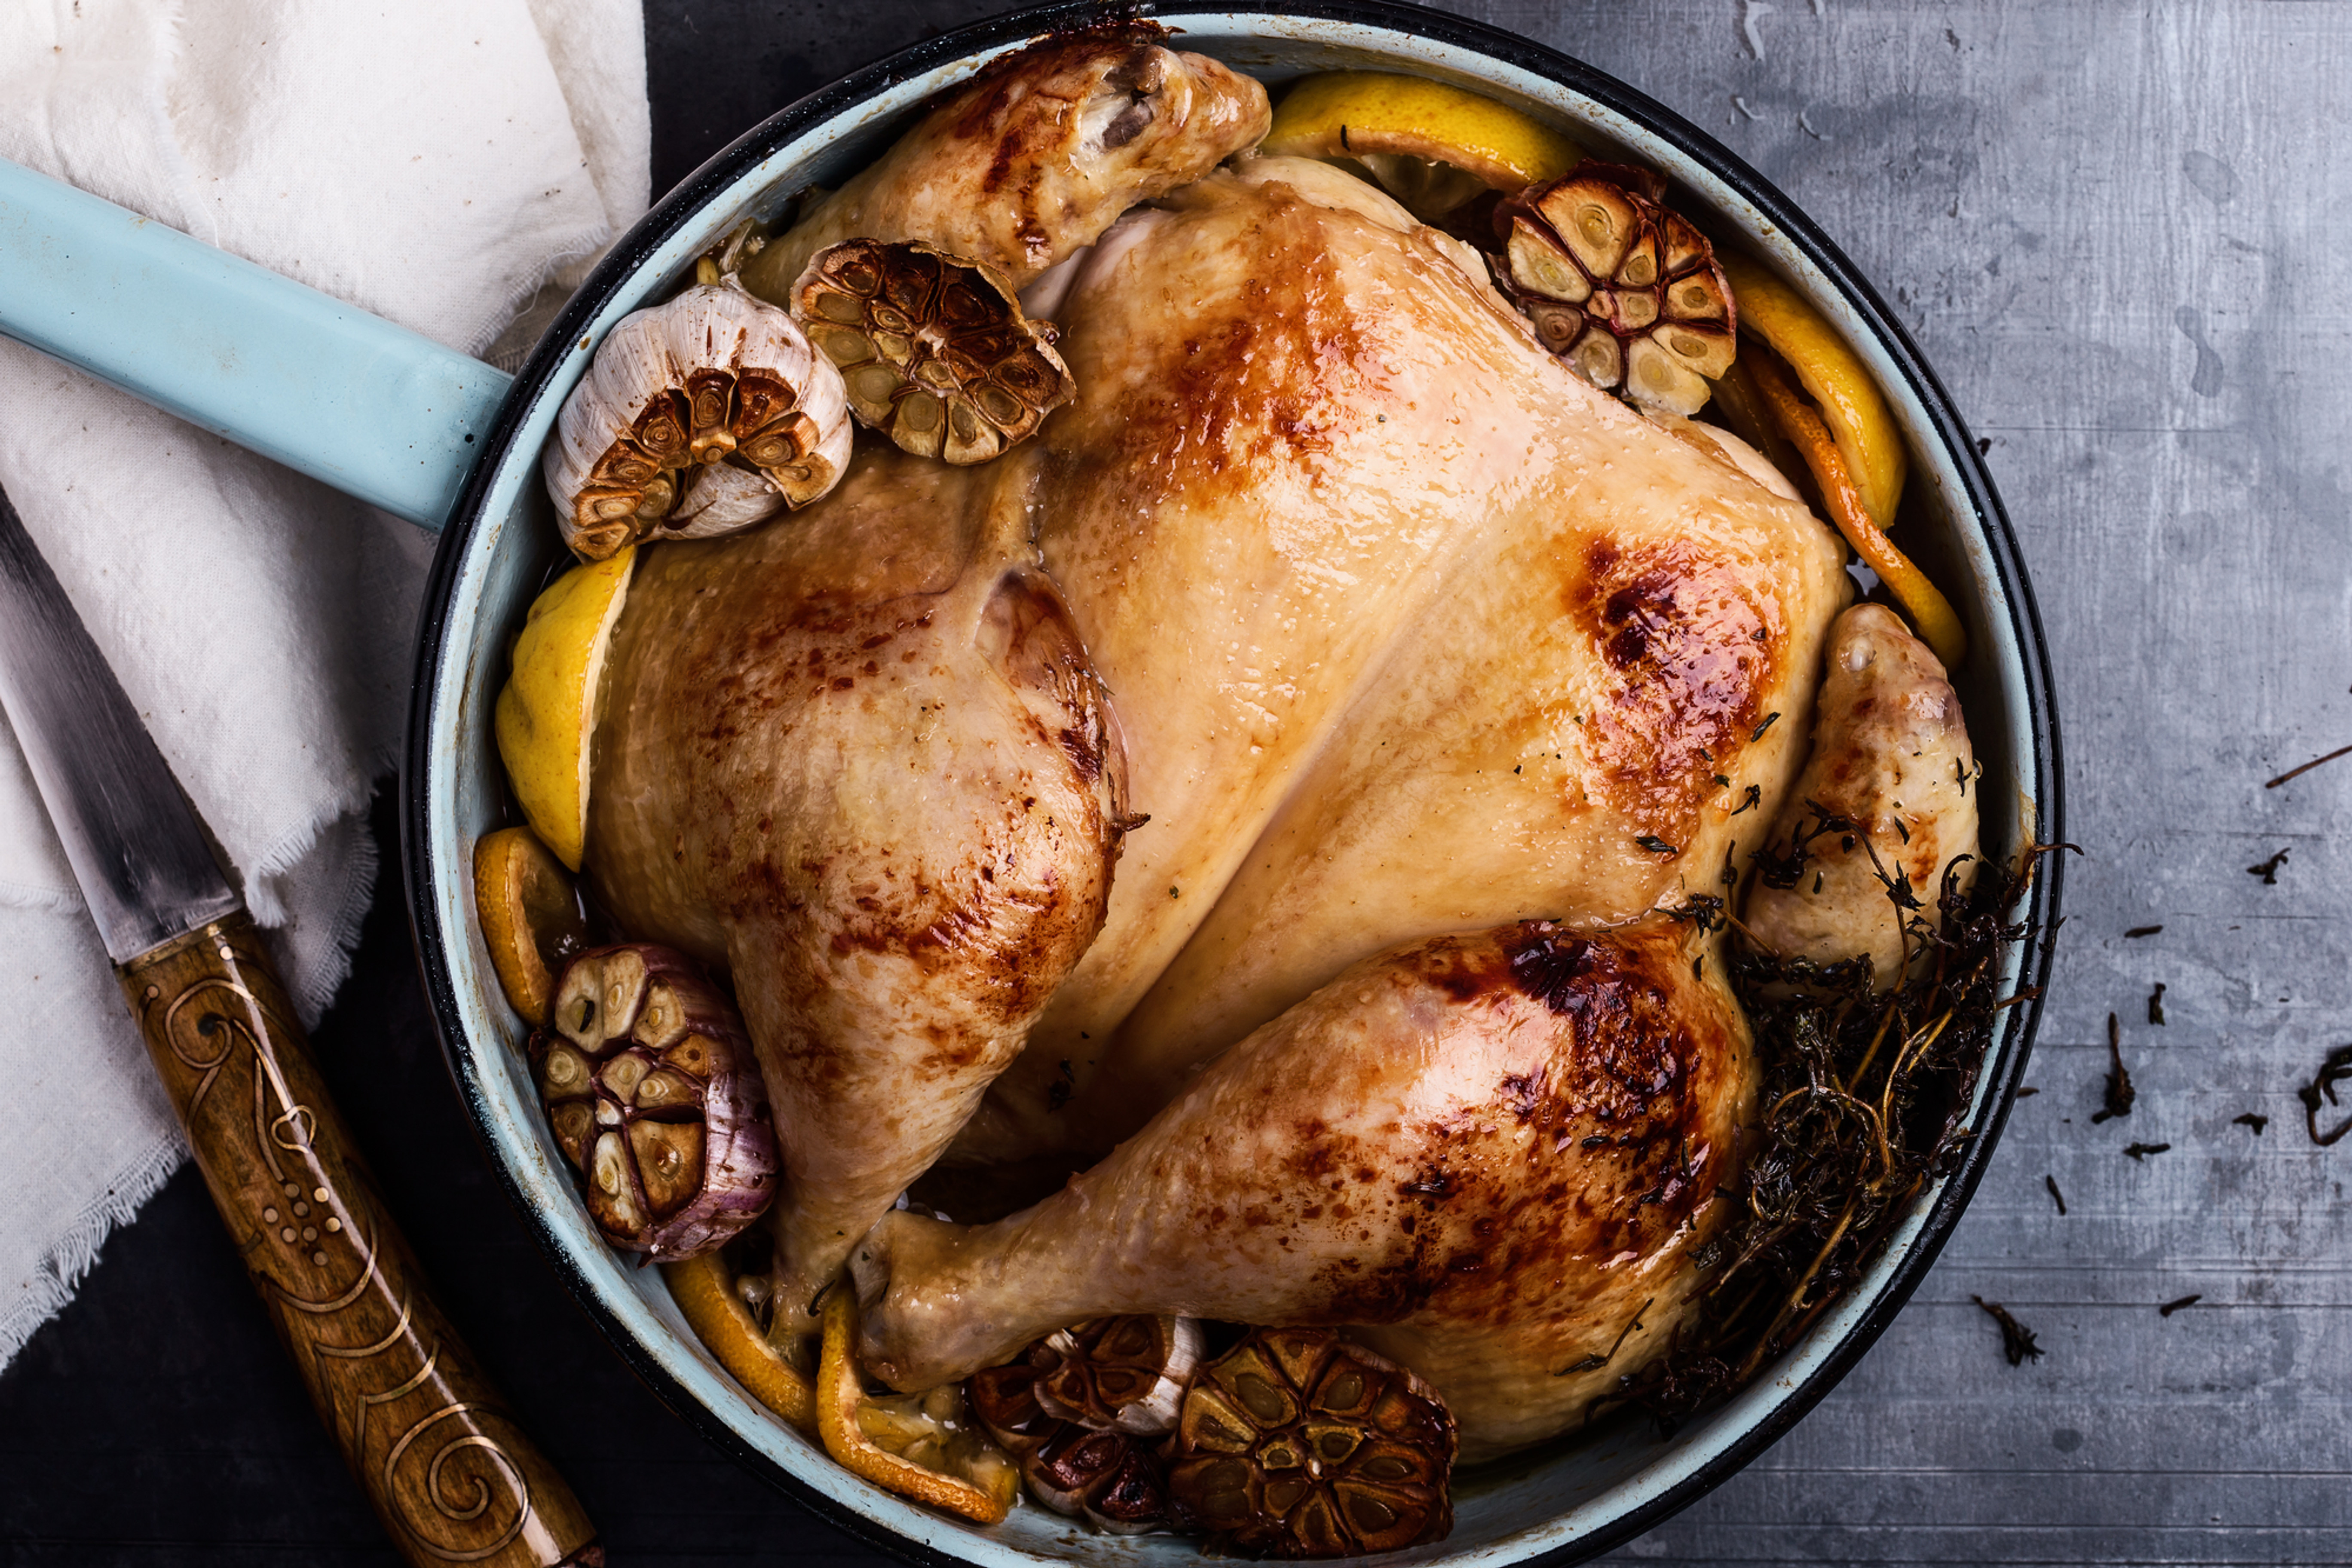 19th June: Winner, Winner Chicken Dinner